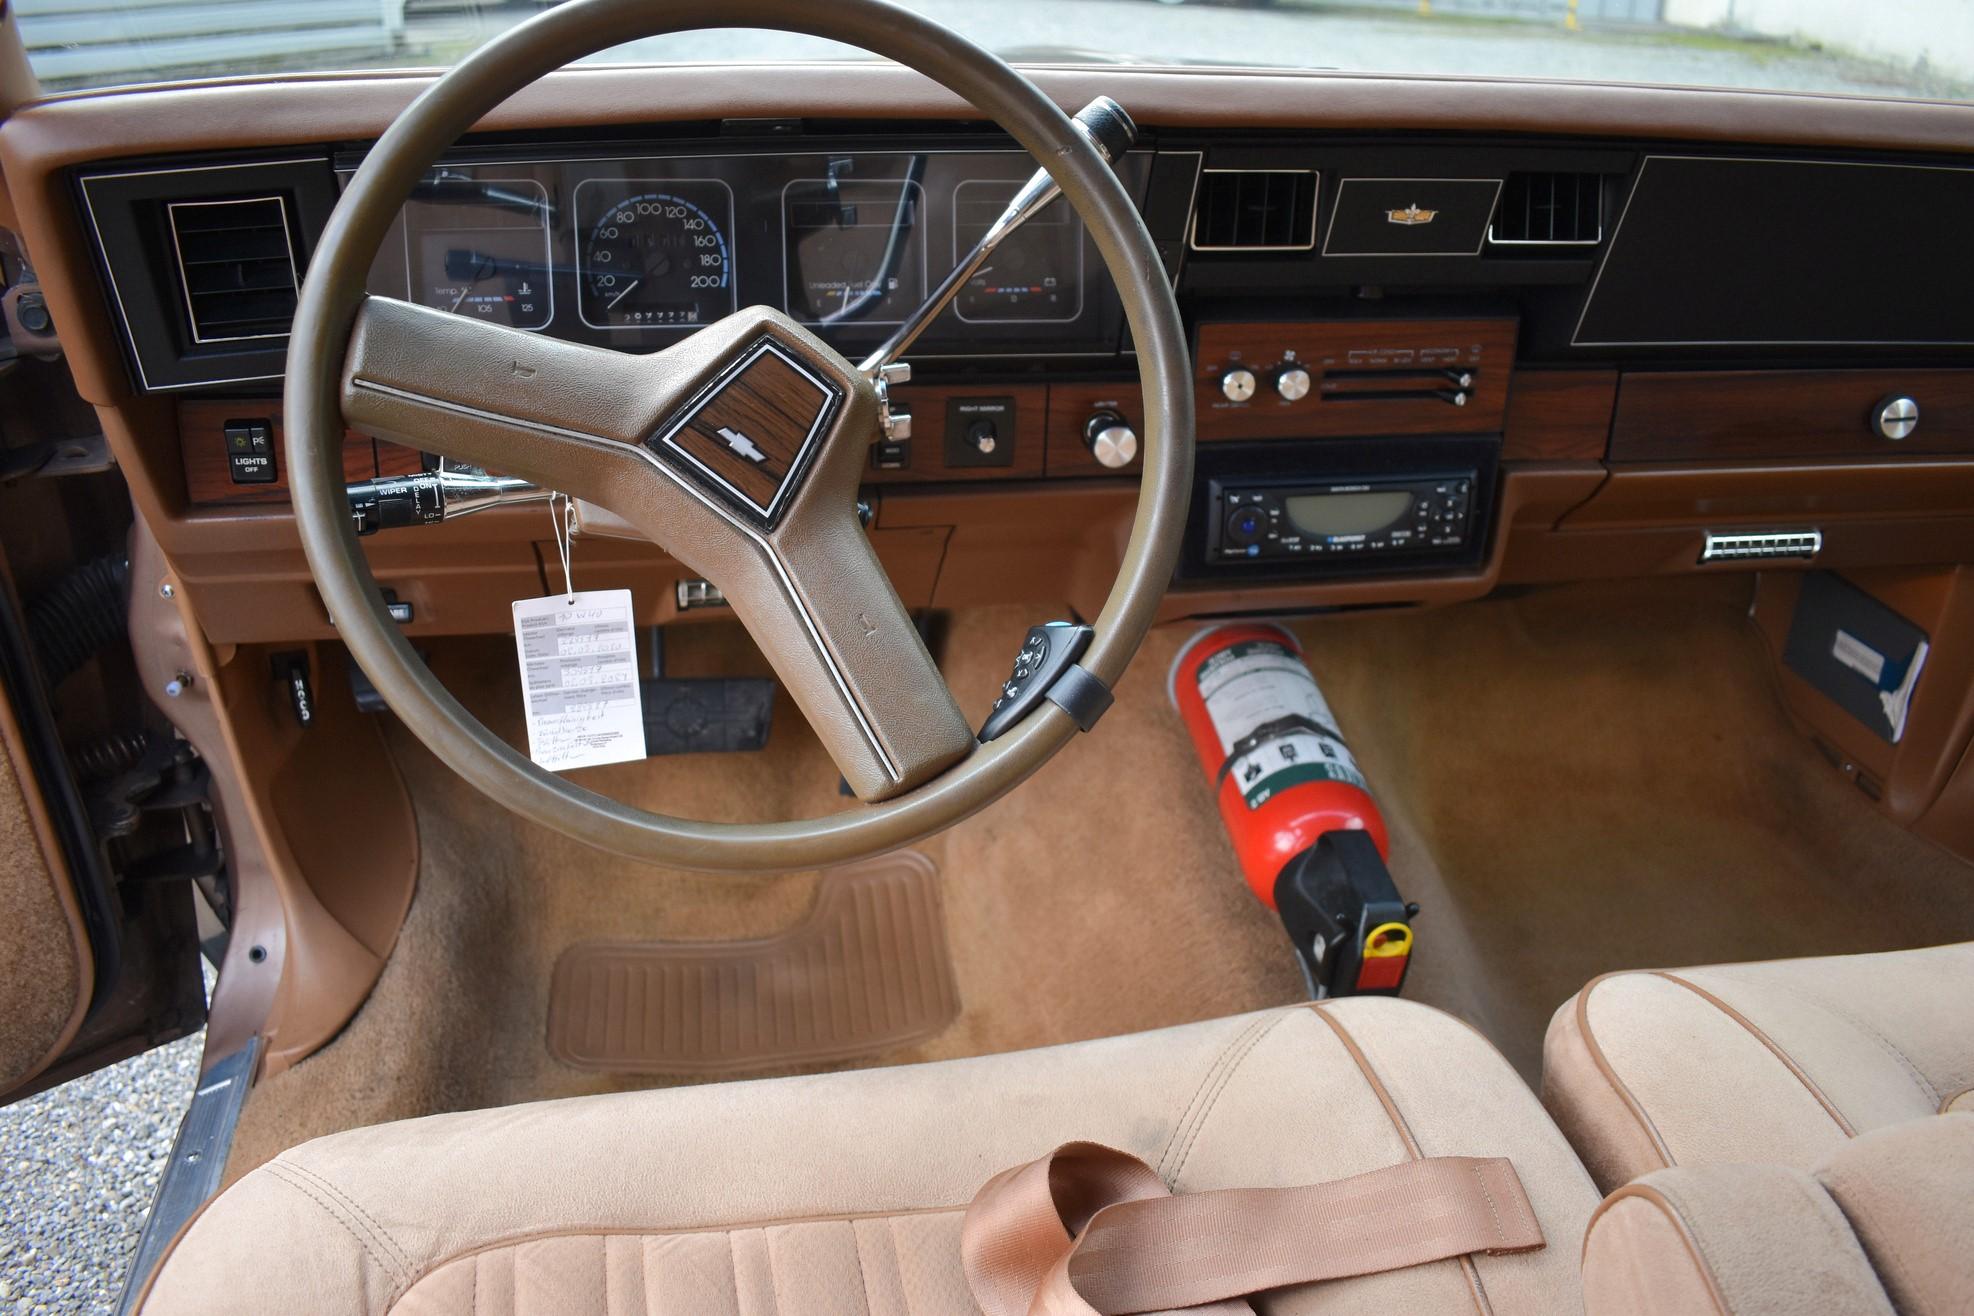 Armaturen eines 1990 Chevrolet Caprice Classic Station Wagon